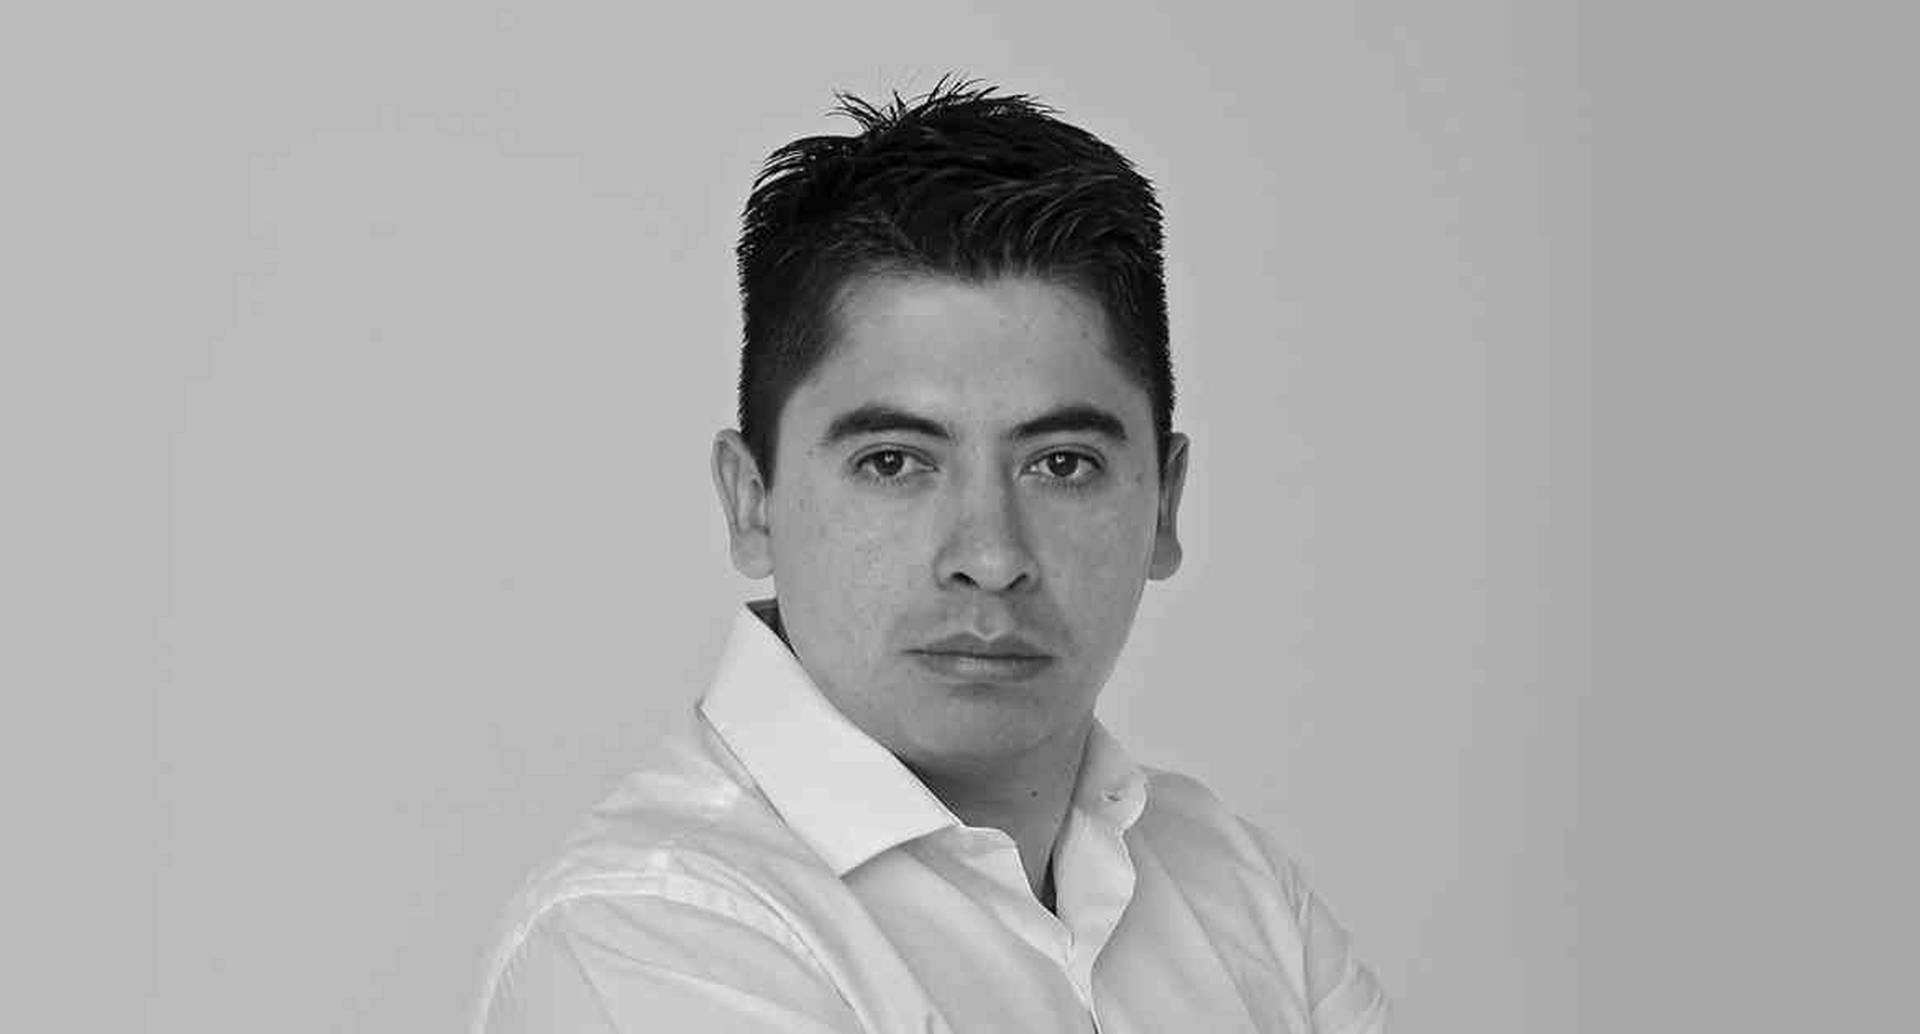 Columna de opinión Ariel Ávila